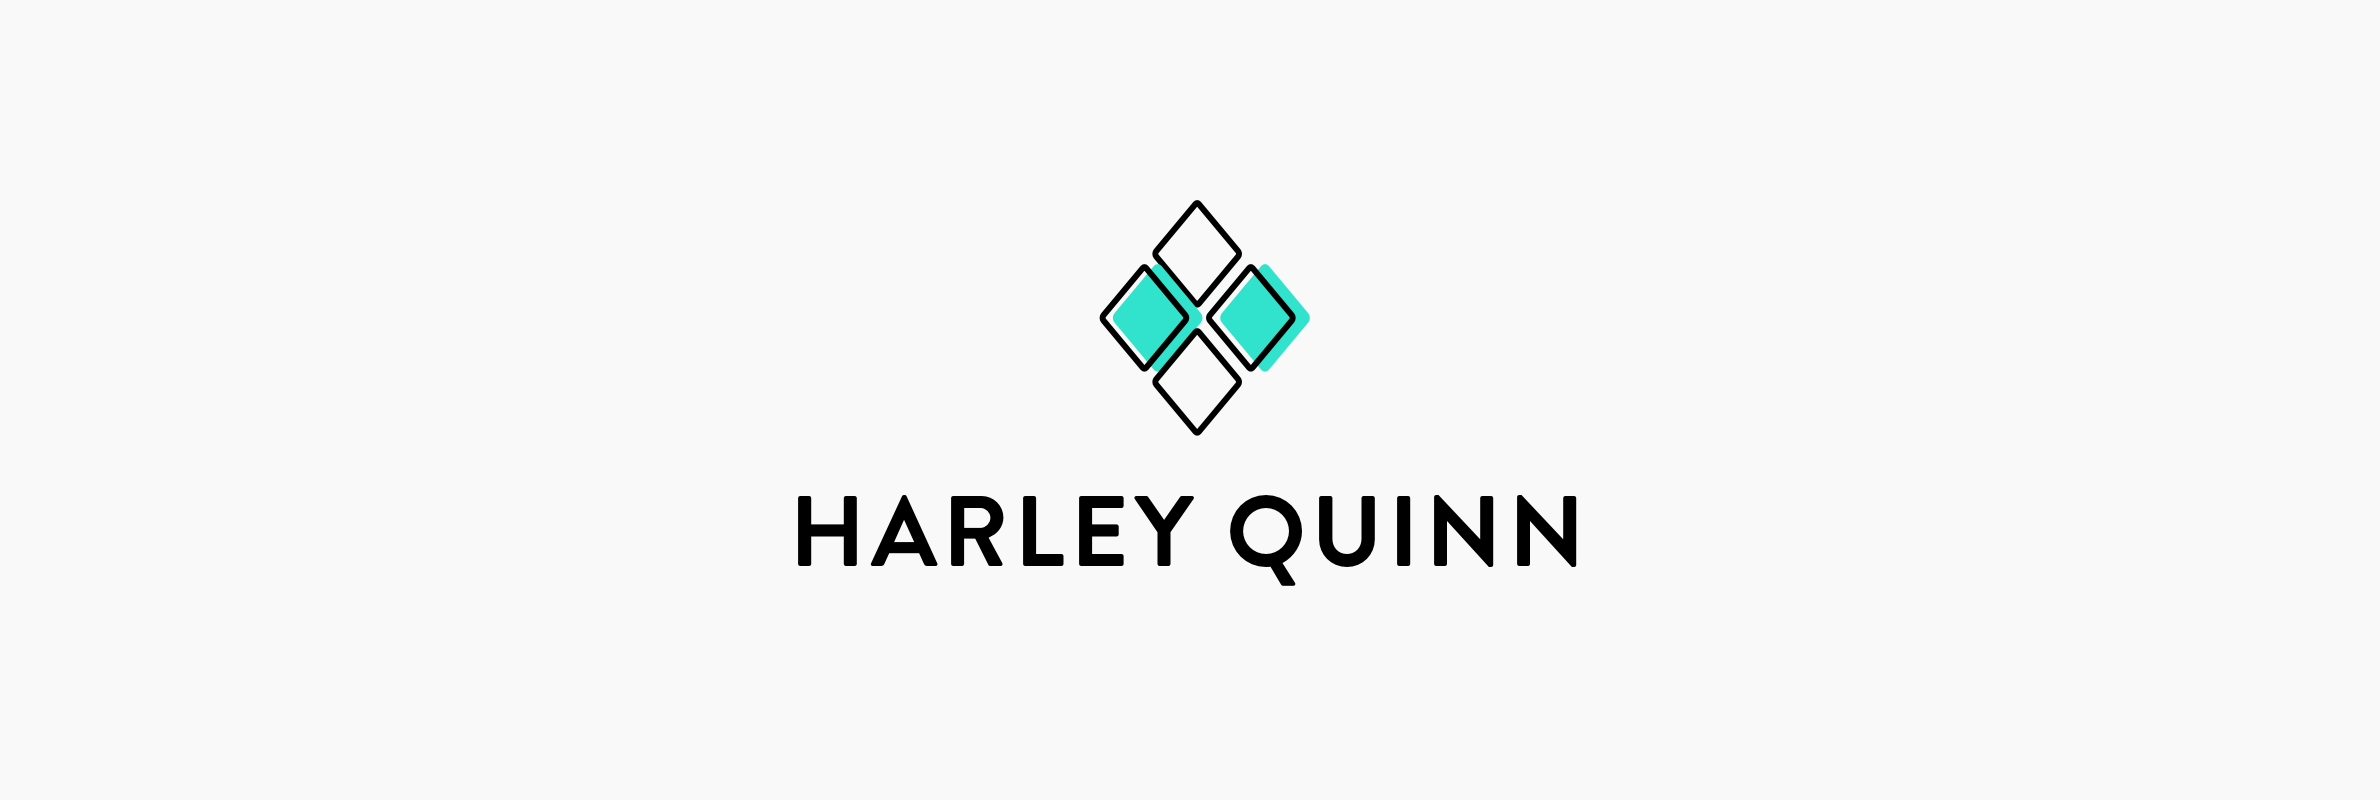 Harley Quinn V2.png